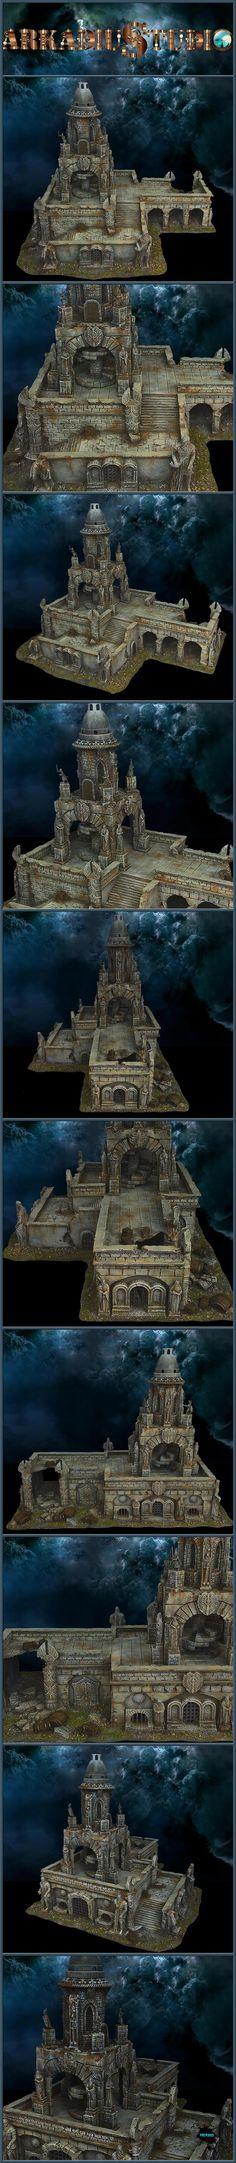 OSGILIATH BELL TOWER RUINS